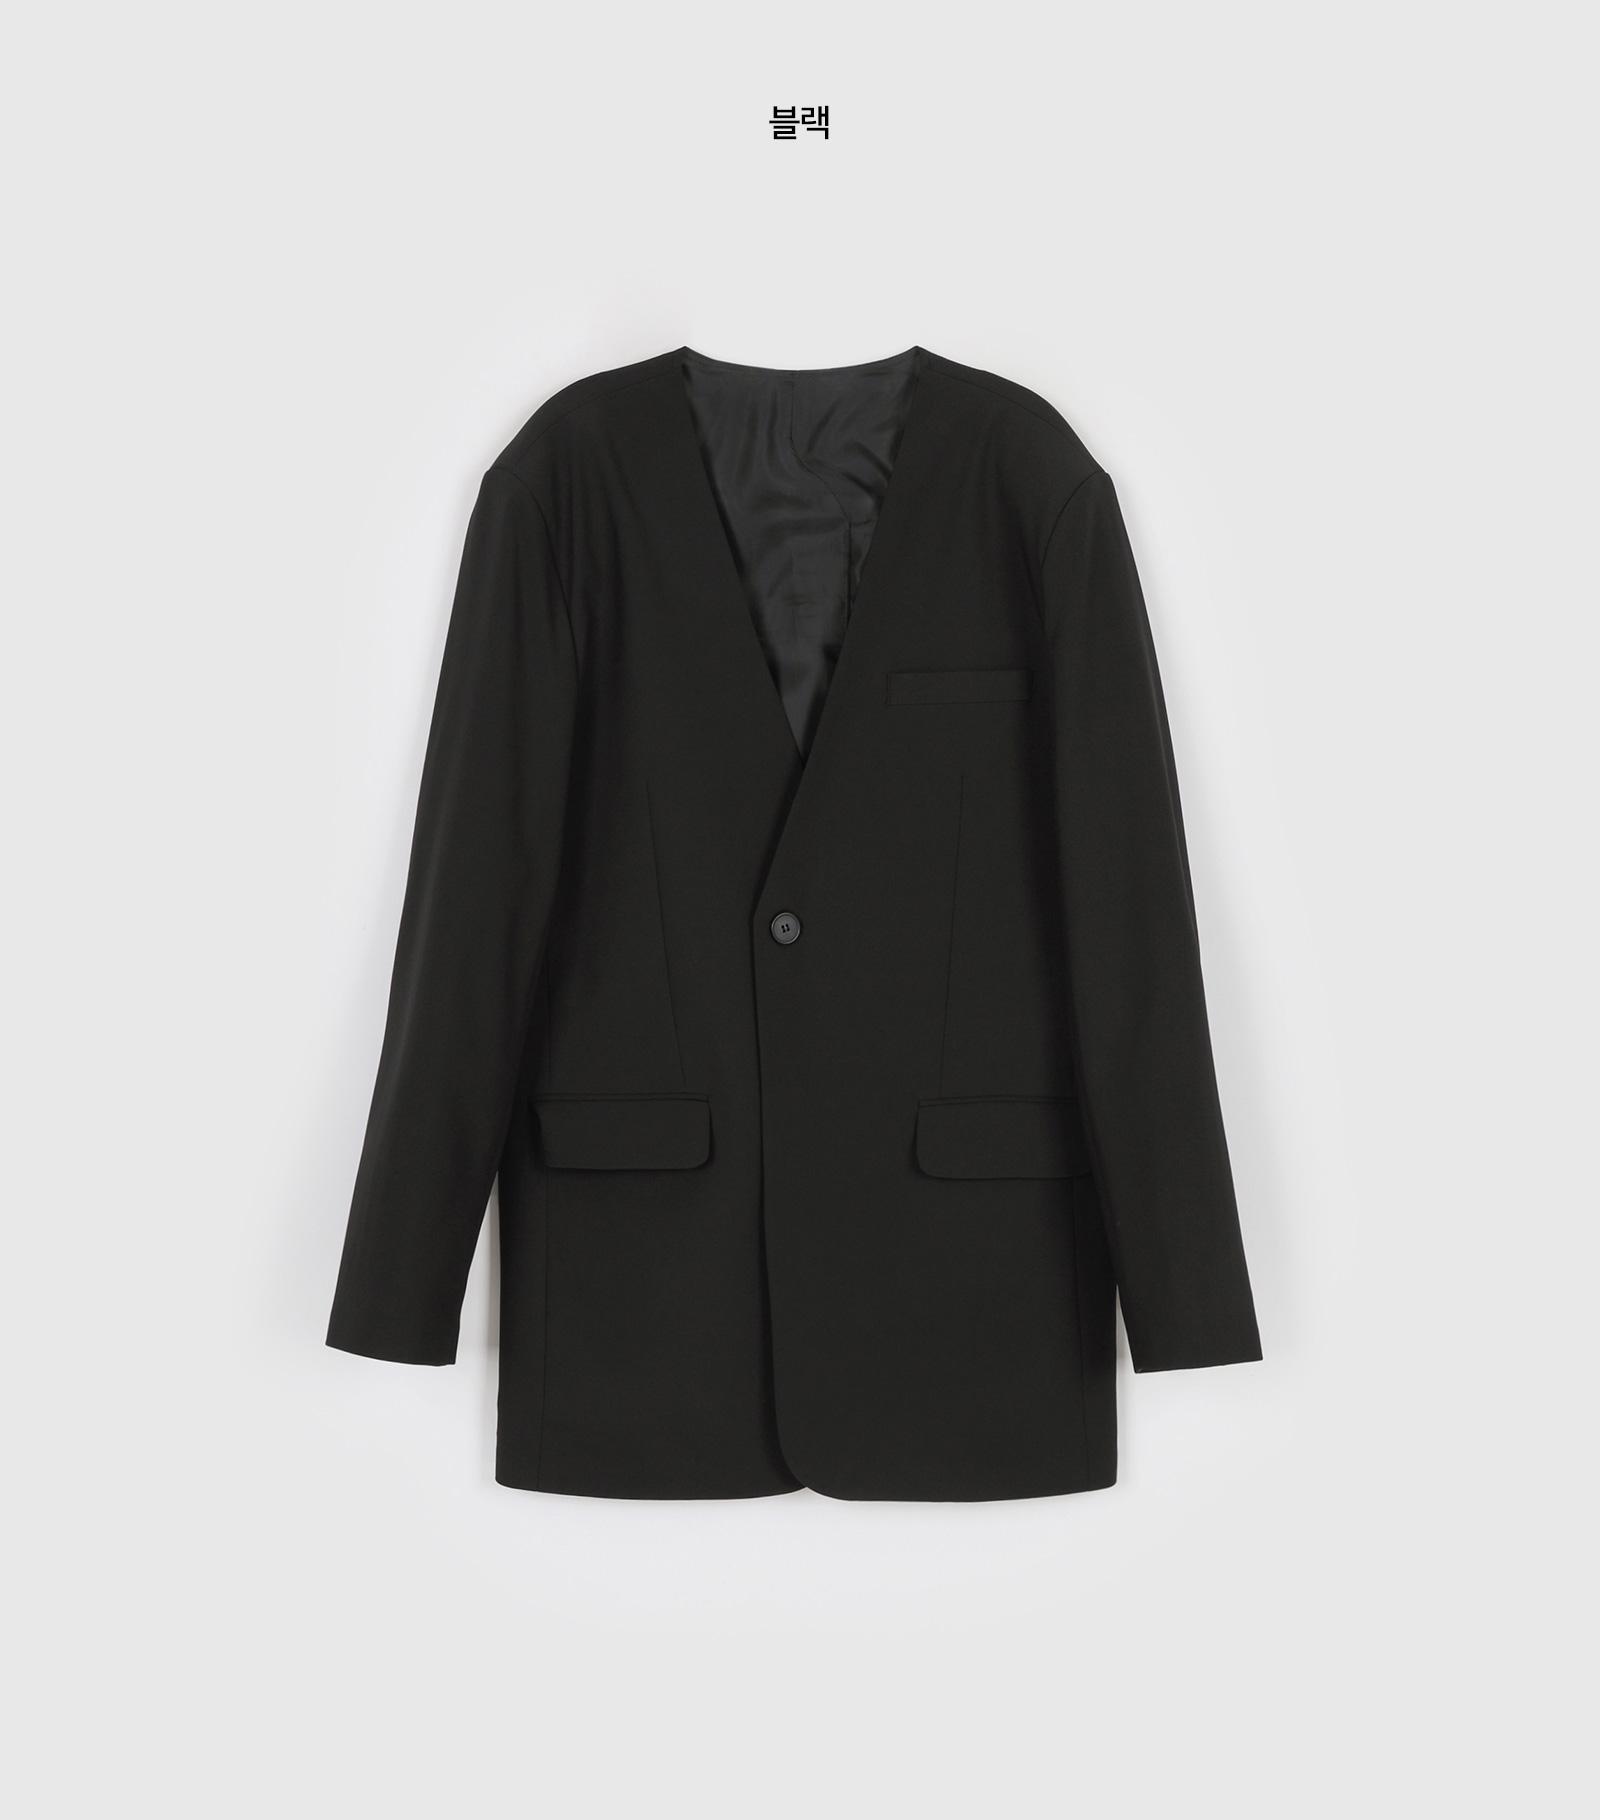 Back button collarless unisex single jacket